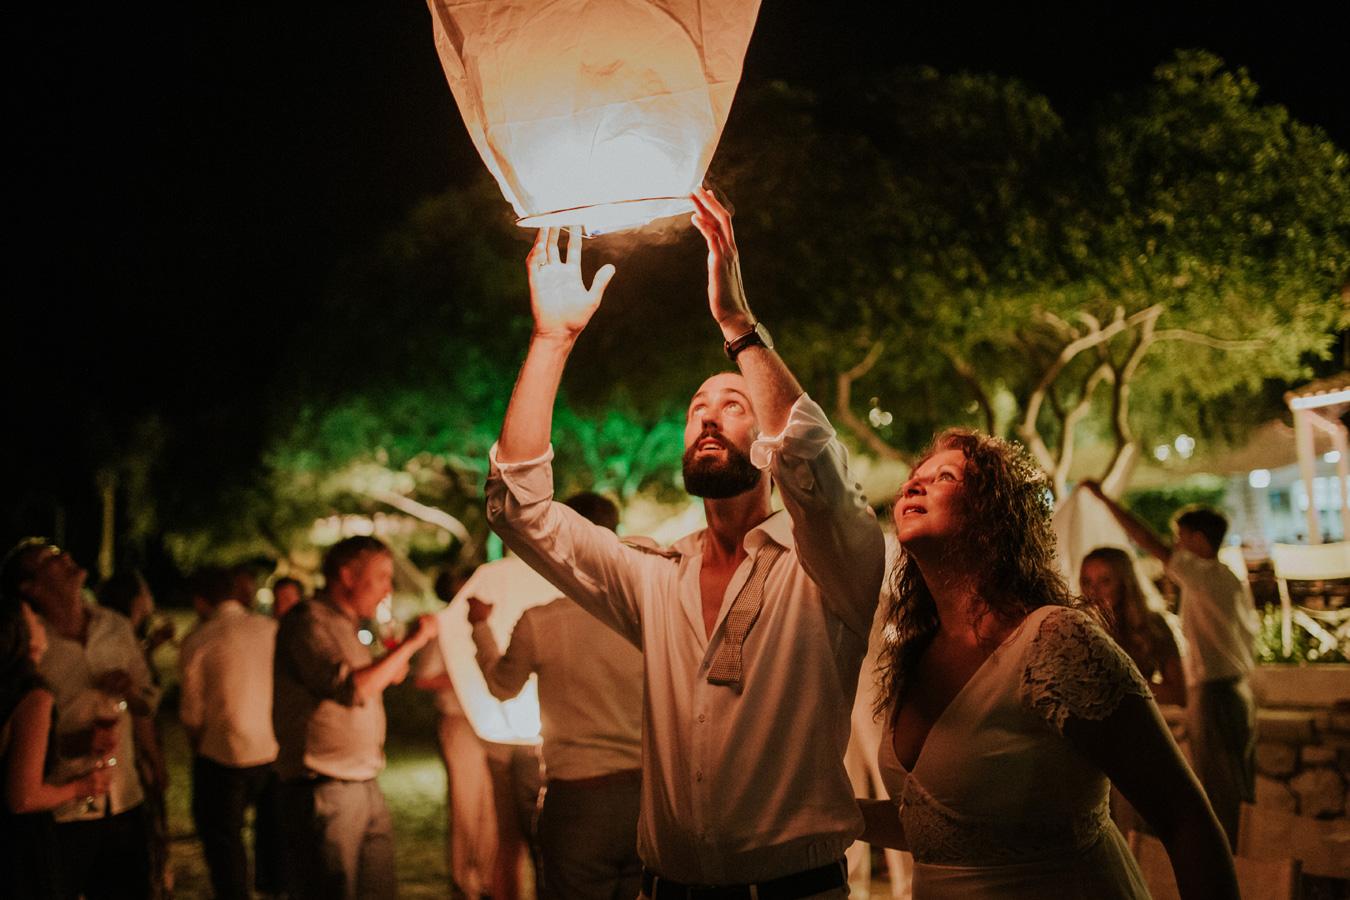 113-bryllupsfotograf-oslo-destinasjonsbryllup-fotograf-tone-tvedt.jpg